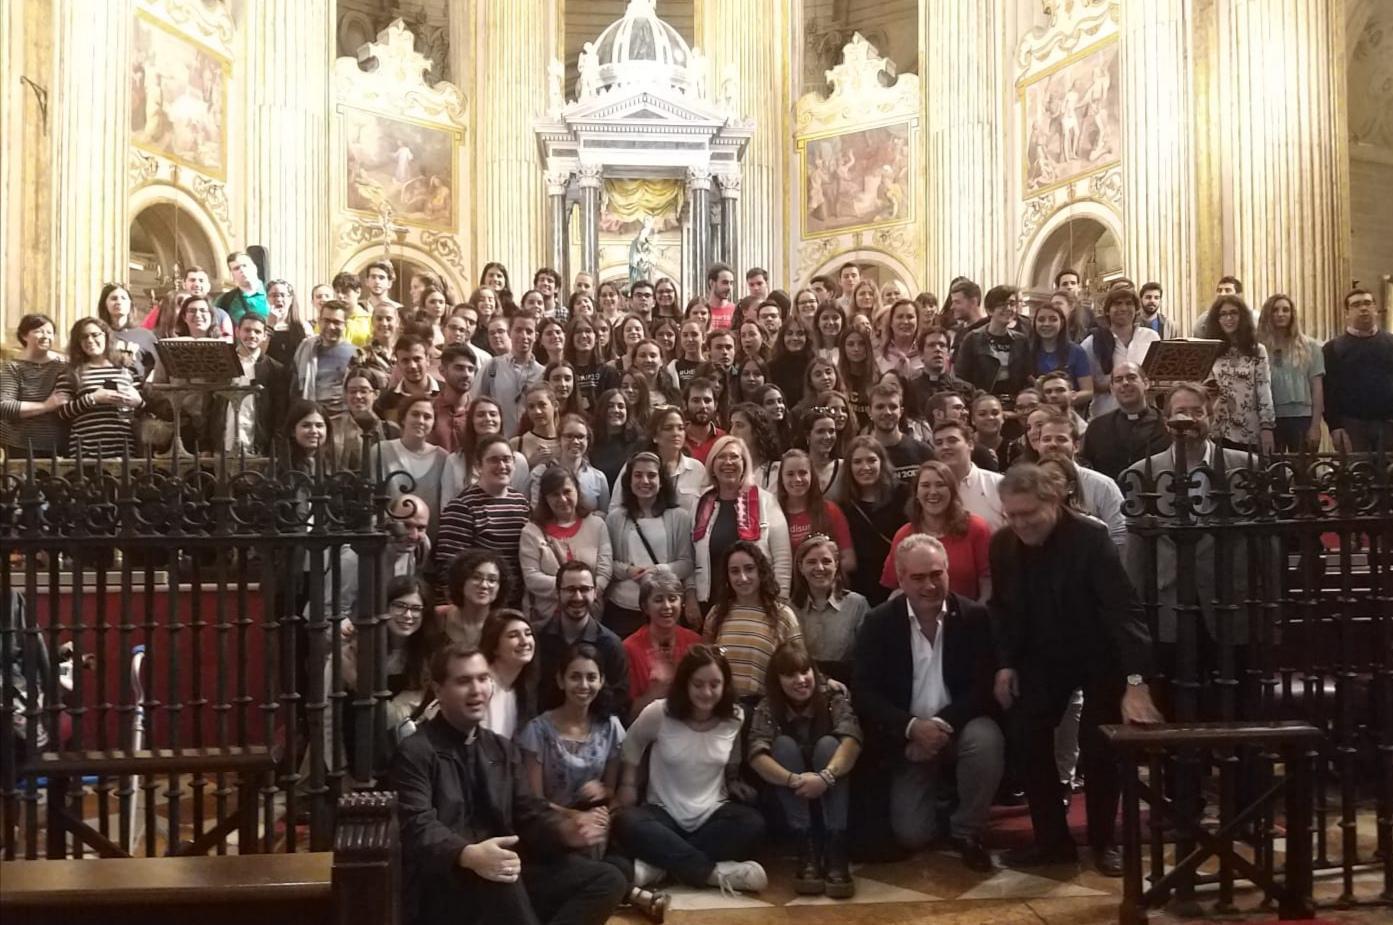 El grupo de participantes de UDISUR19 en la Catedral